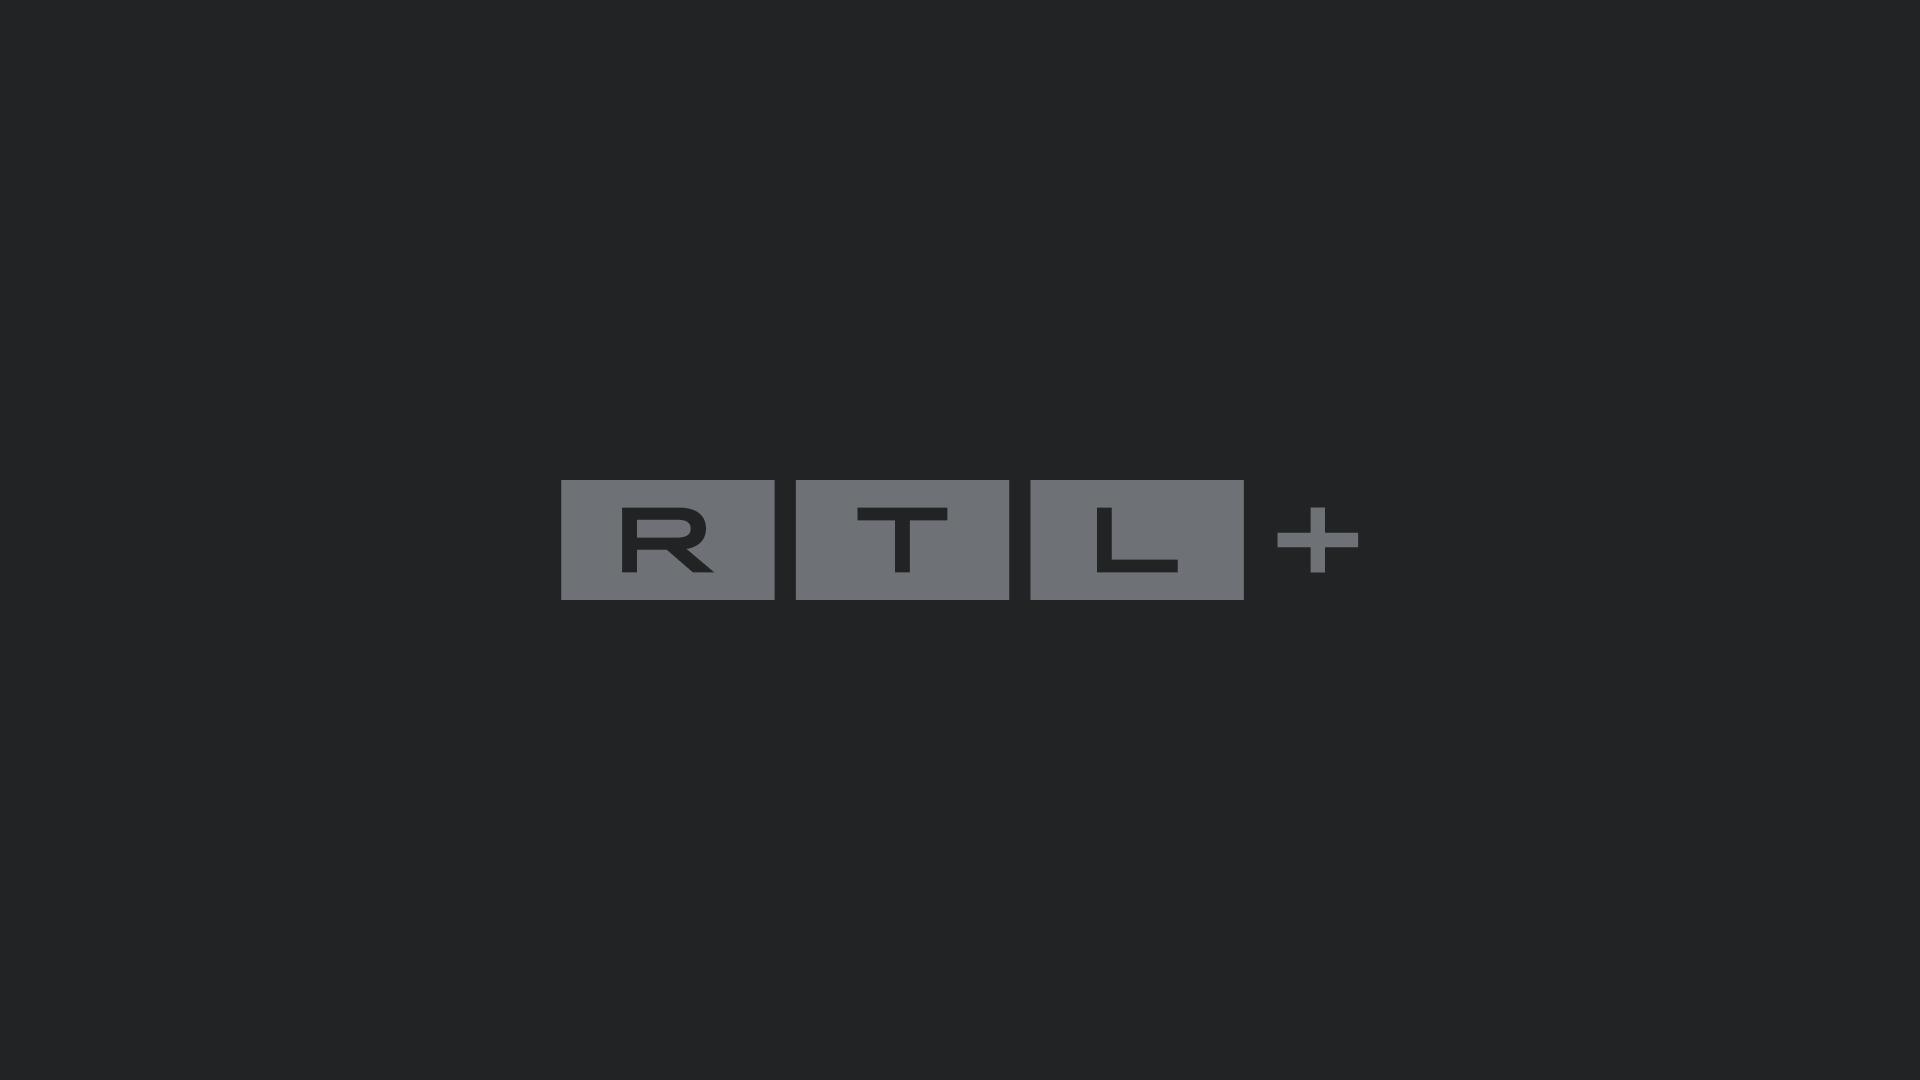 Die Mary Stuart-Verschwörung | Folge 1